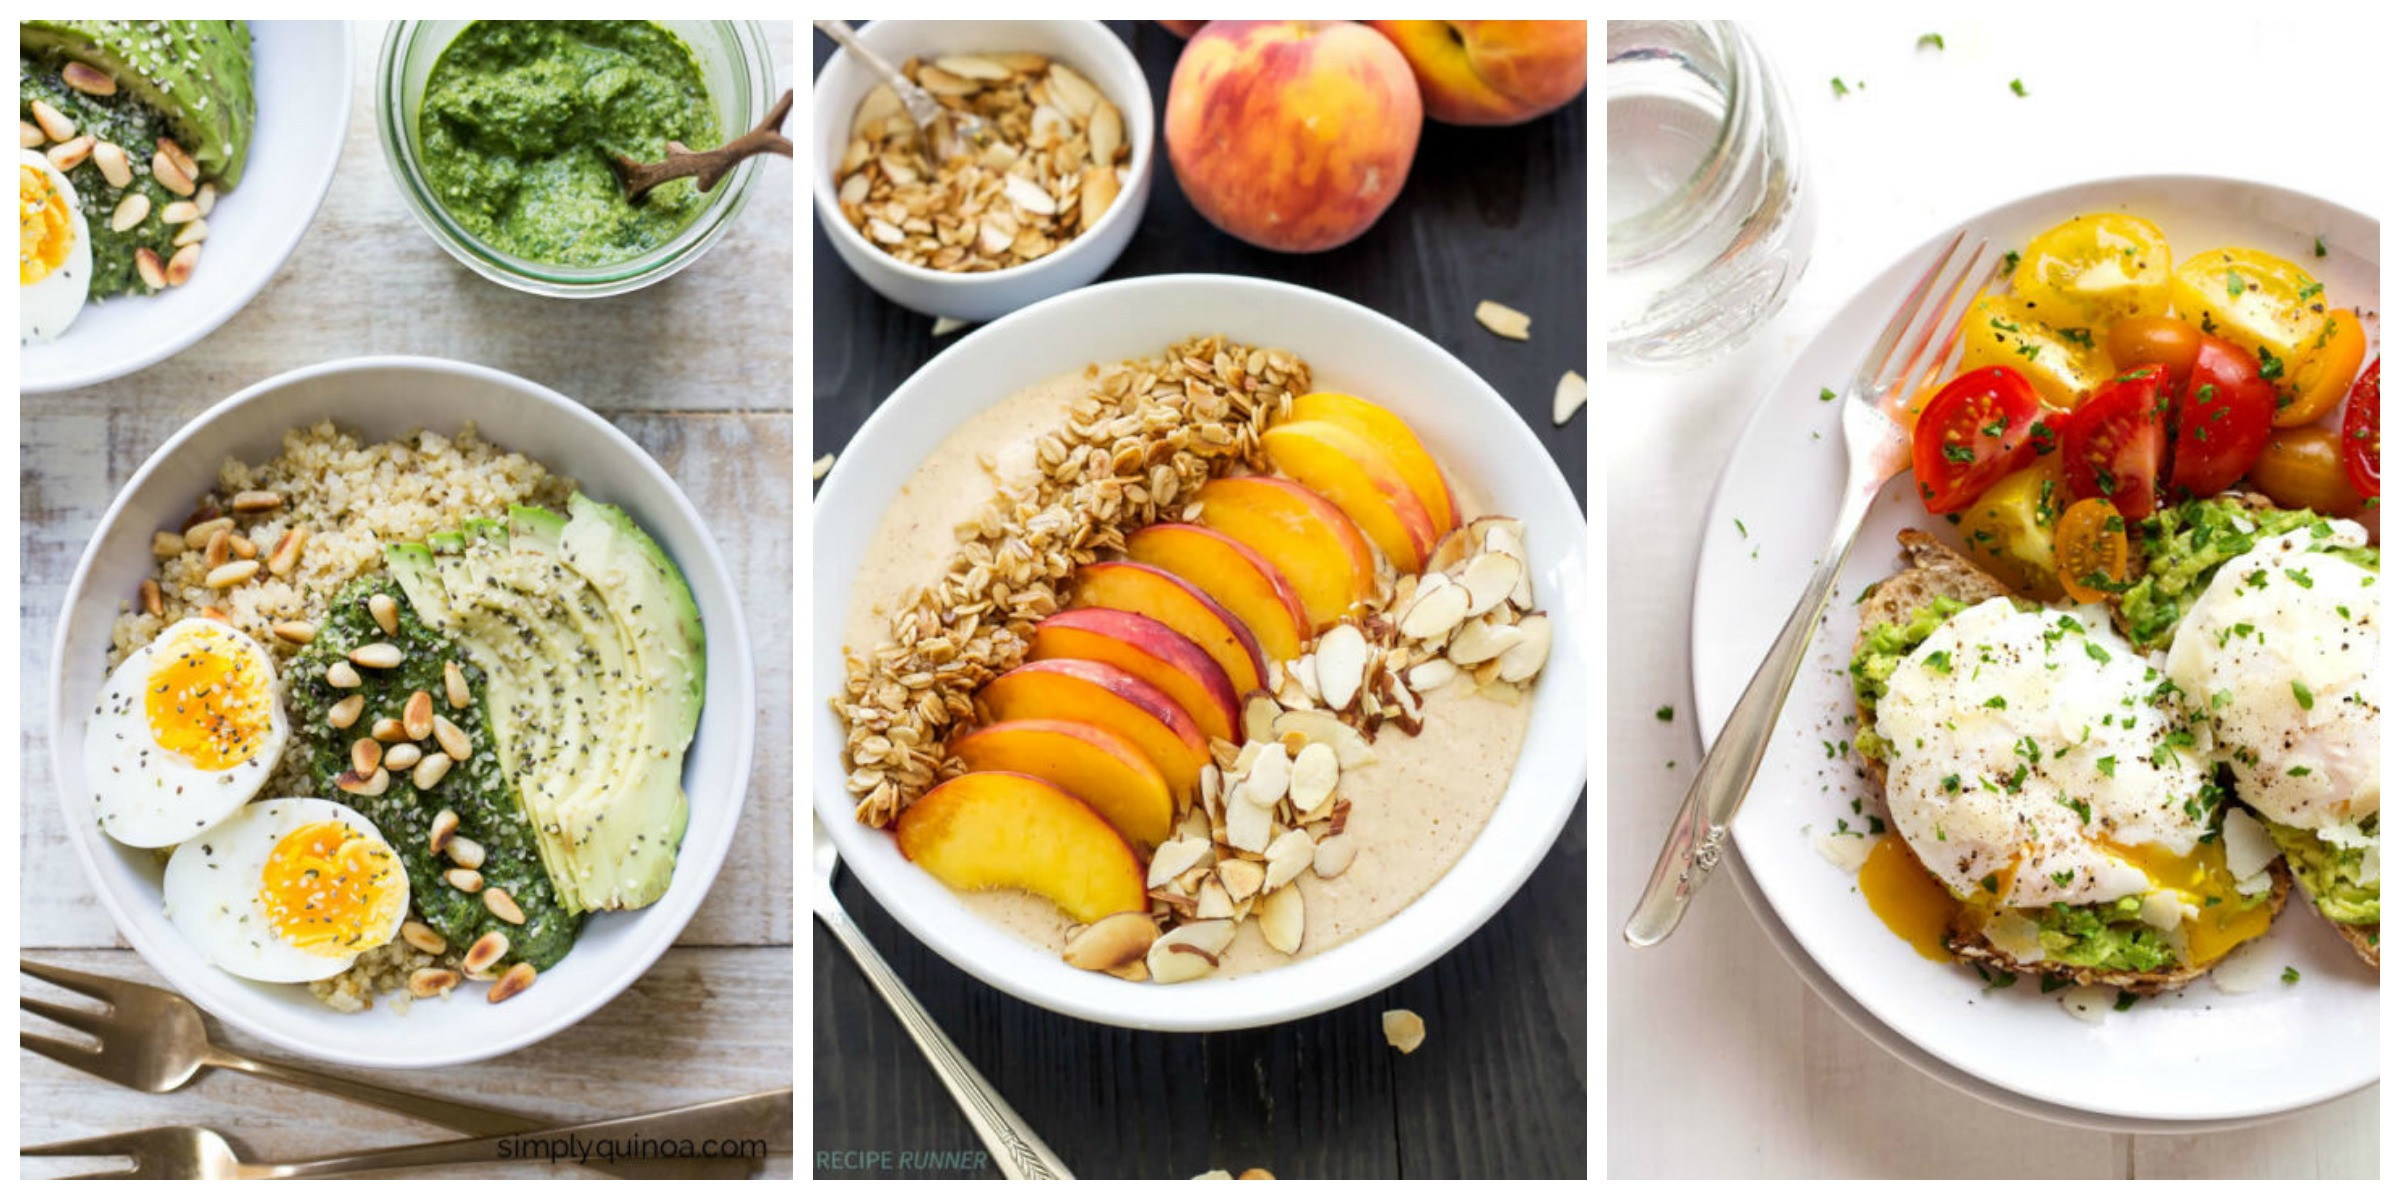 Healthy Breakfast Items  20 Best Healthy Breakfast Food Ideas Recipes for Healthy